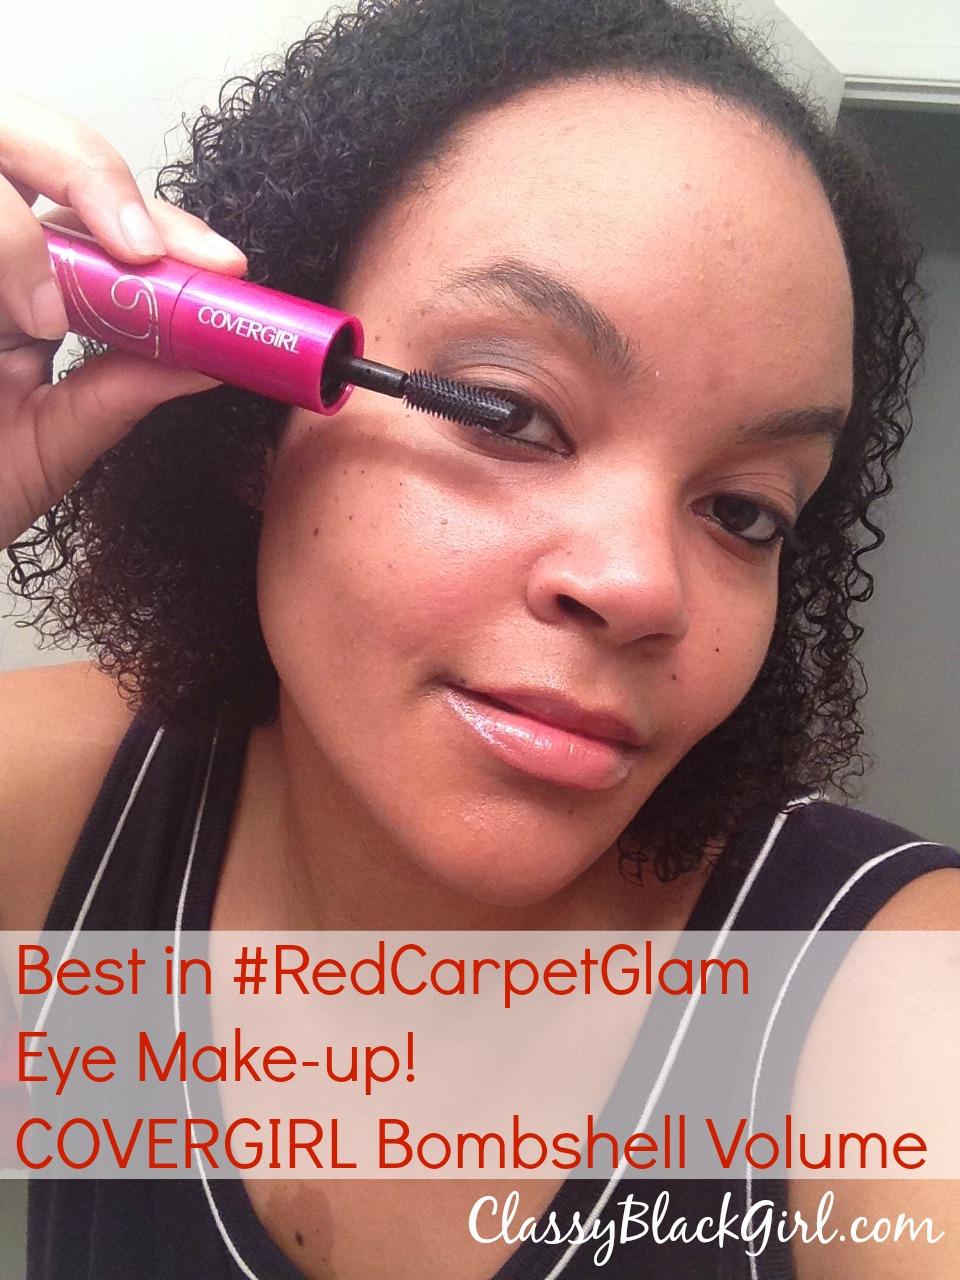 #RedCarpetGlam #clevergirls #sponsored #ad ClassyBlackGirl CoverGirl Bombshell Volume